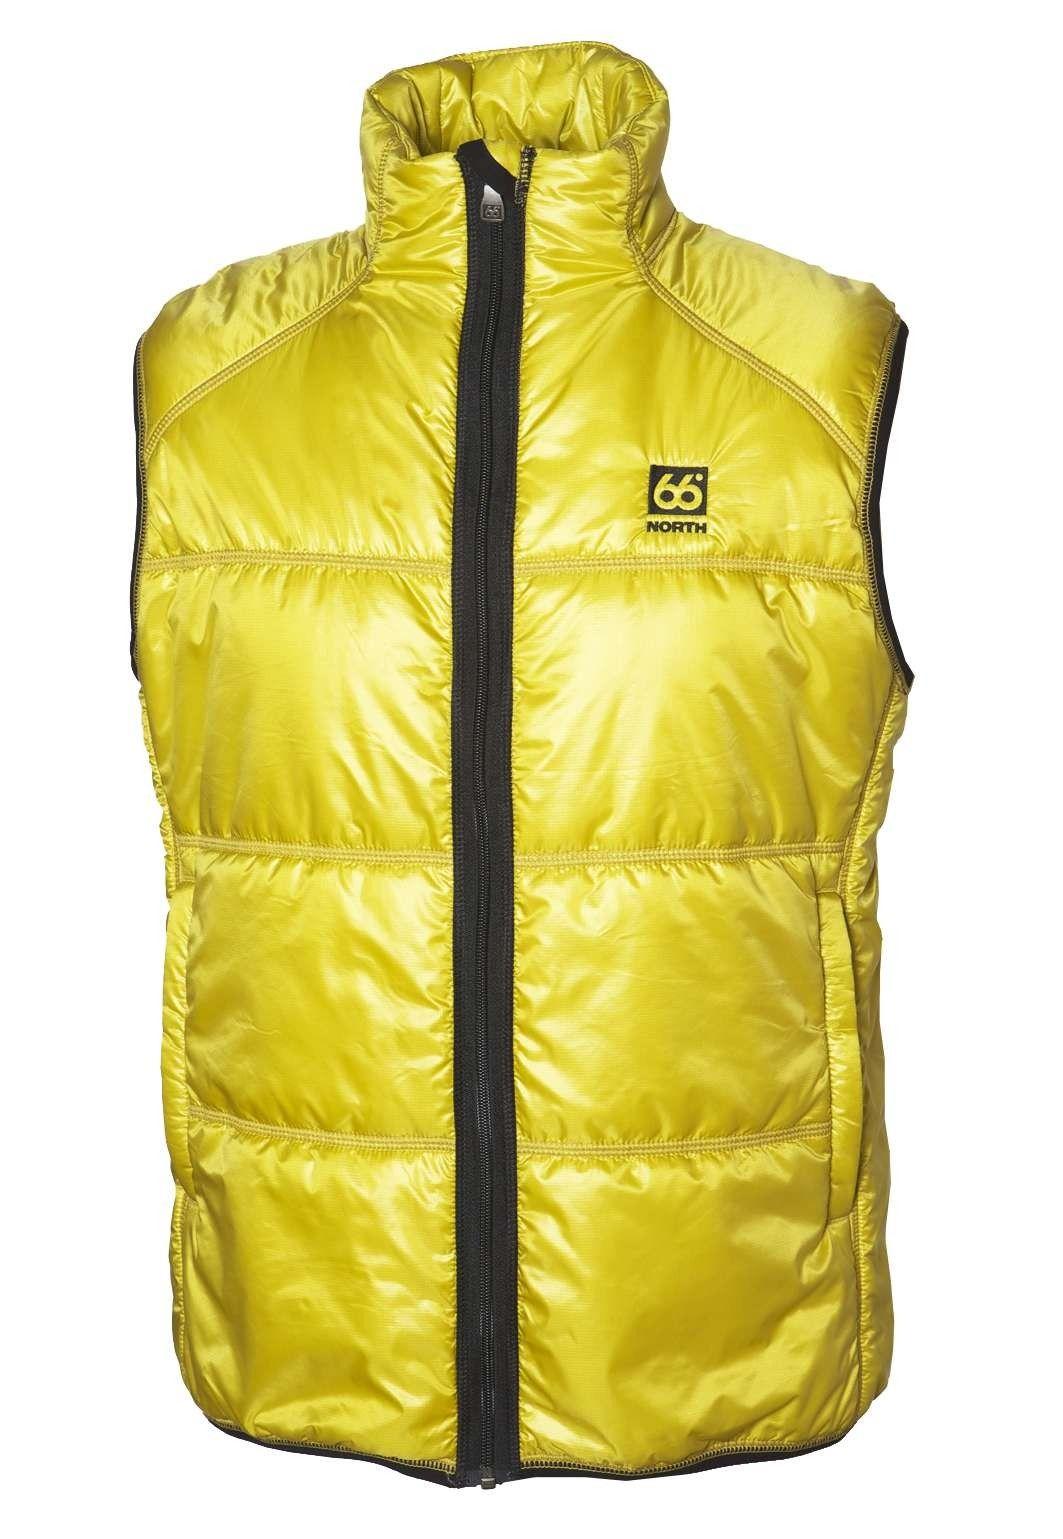 Vatnajokull Primaloft Vest Outdoor outfit, Vest, 66north